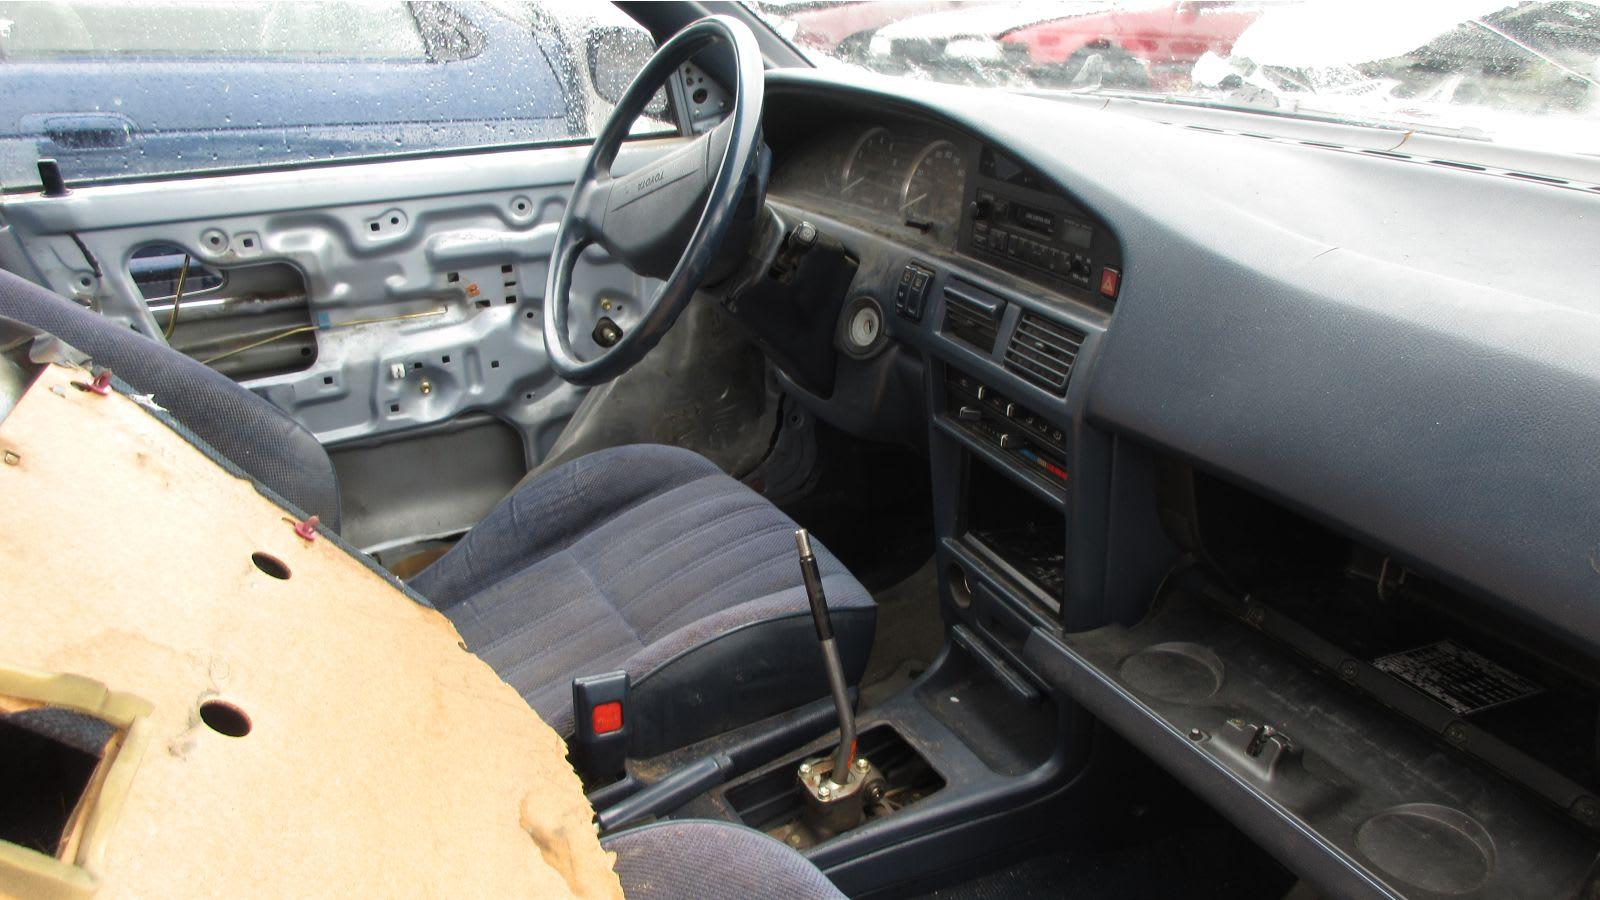 1991 Toyota Corolla DX Wagon art car junkyard find | Autoblog